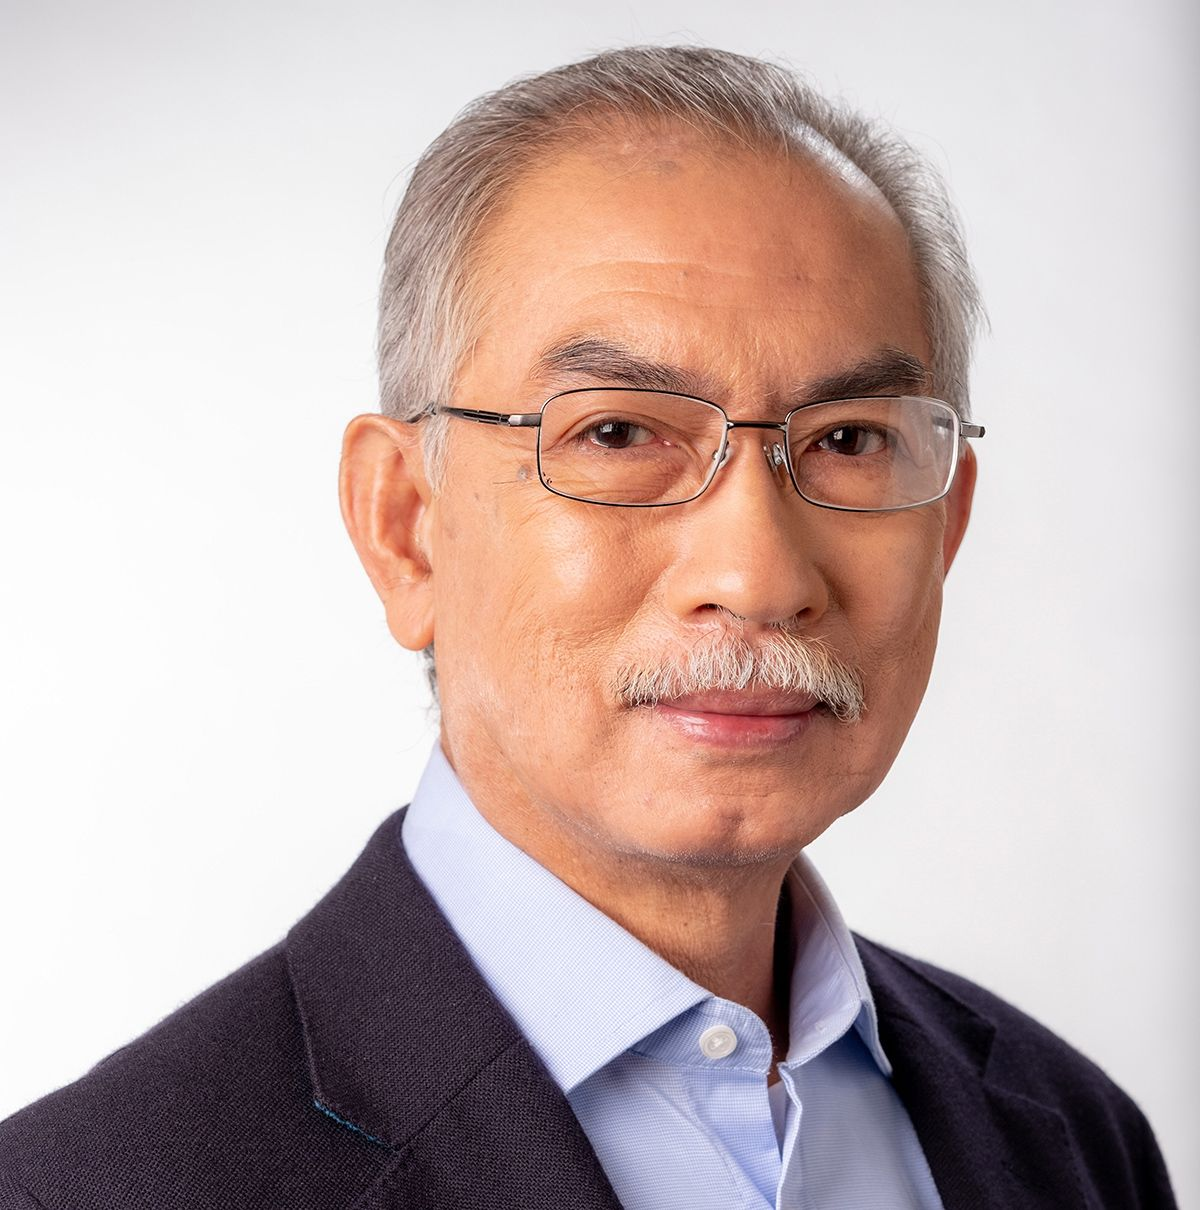 Filipino Sociologist Randy David Wins Fukuoka Grand Prize 2019